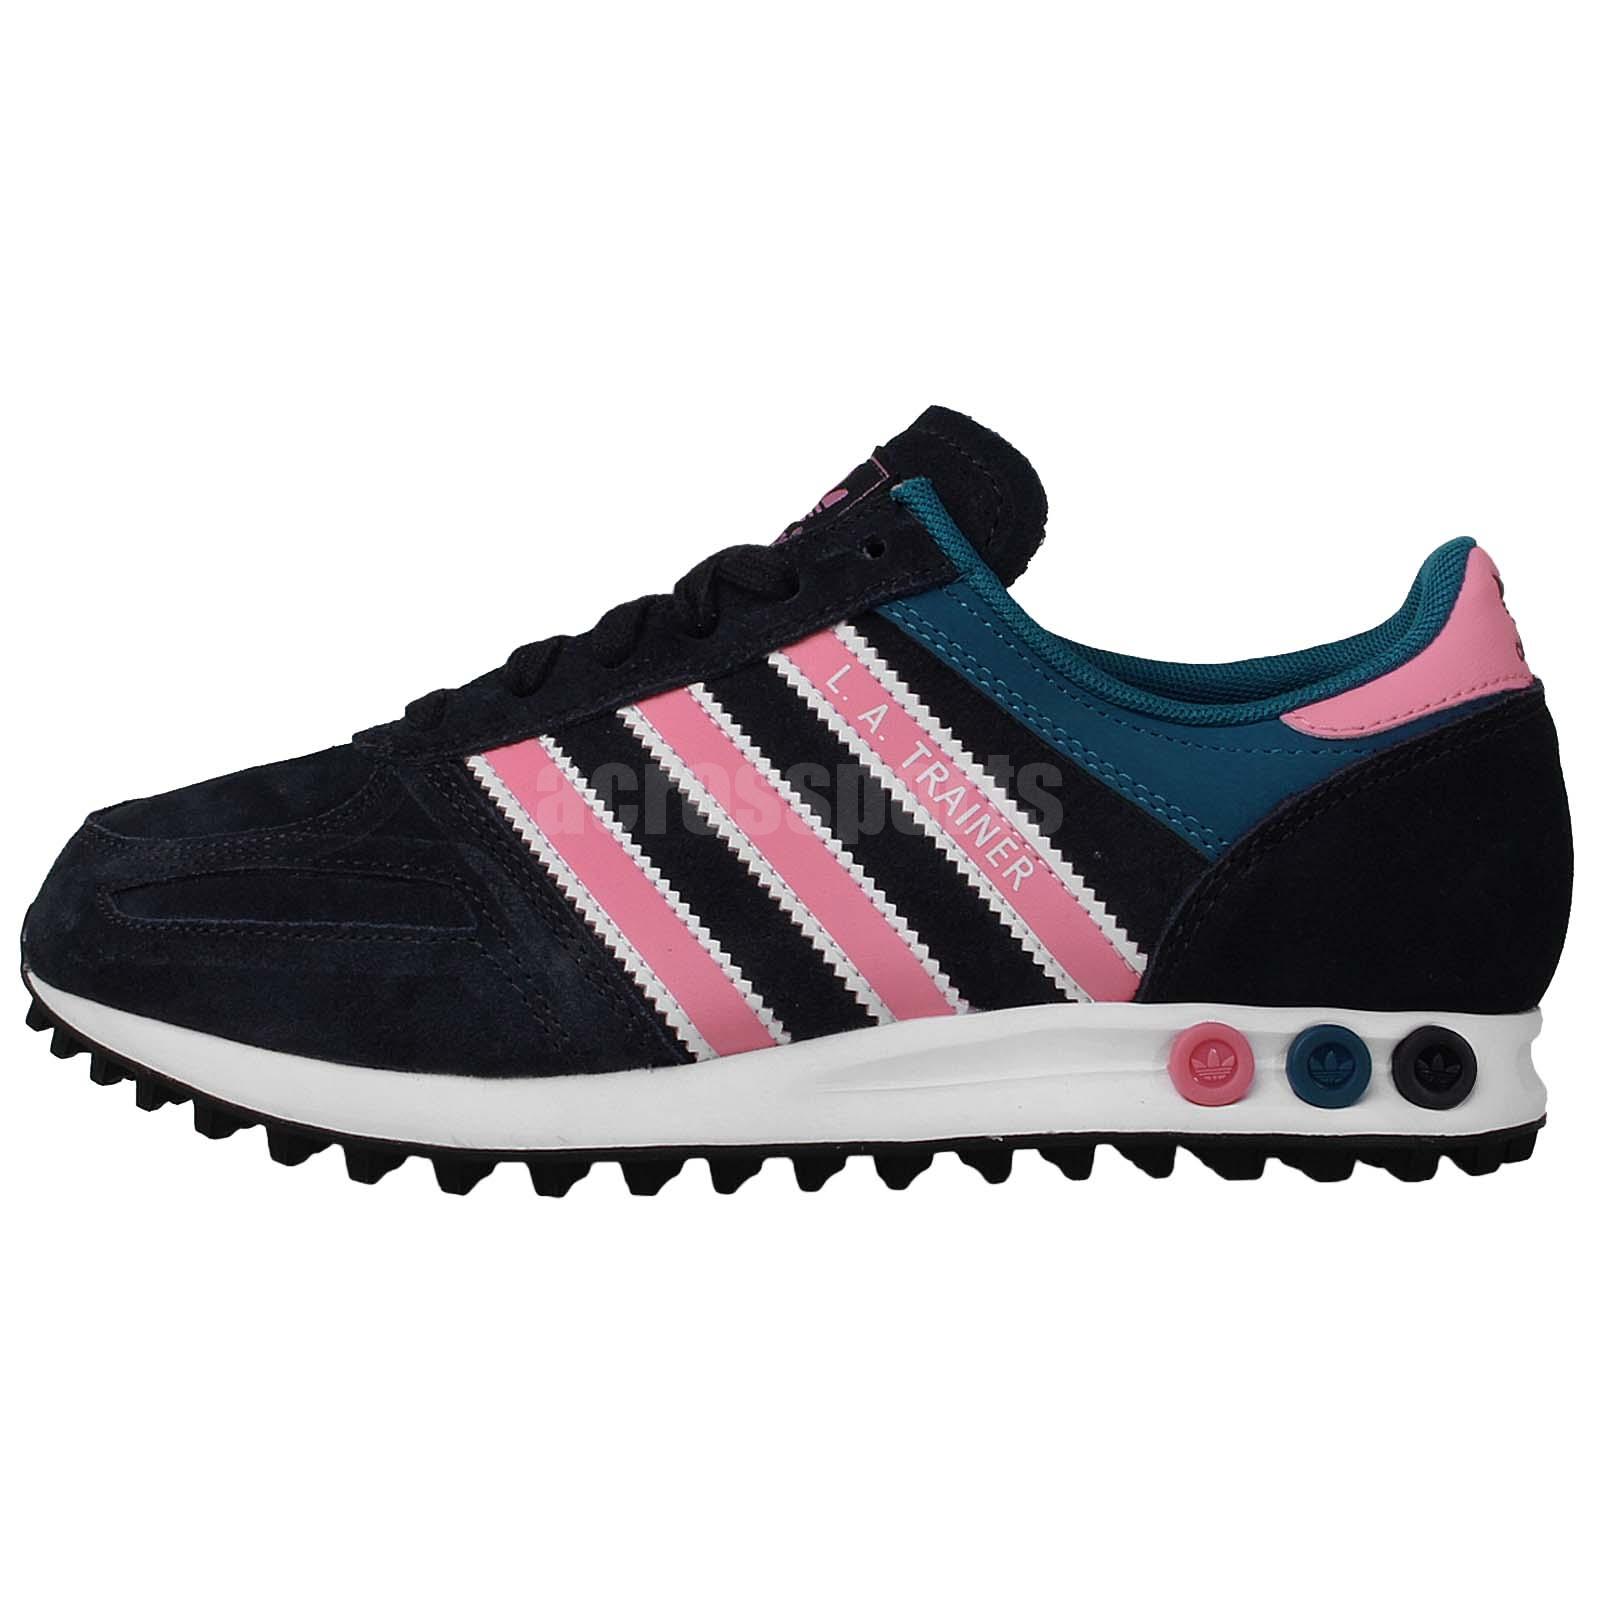 Adidas Originals LA Trainer W Navy Pink Womens Retro Running Casual Shoes M20869